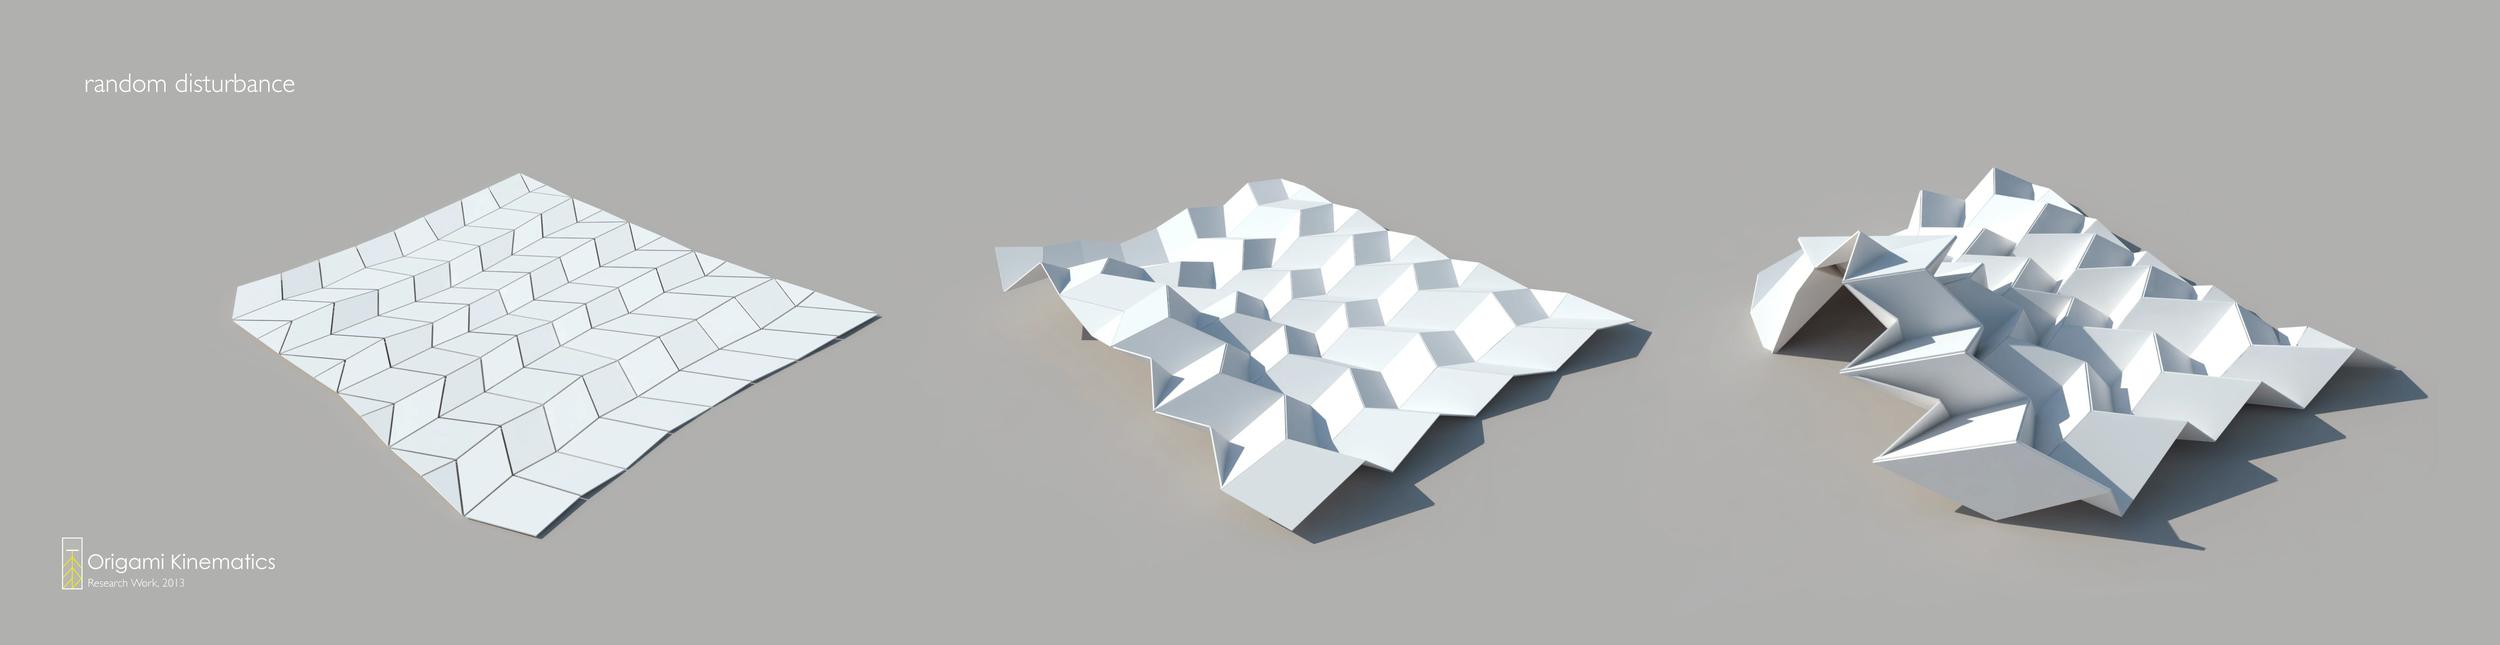 Foldingrandom_angles_ps.jpg